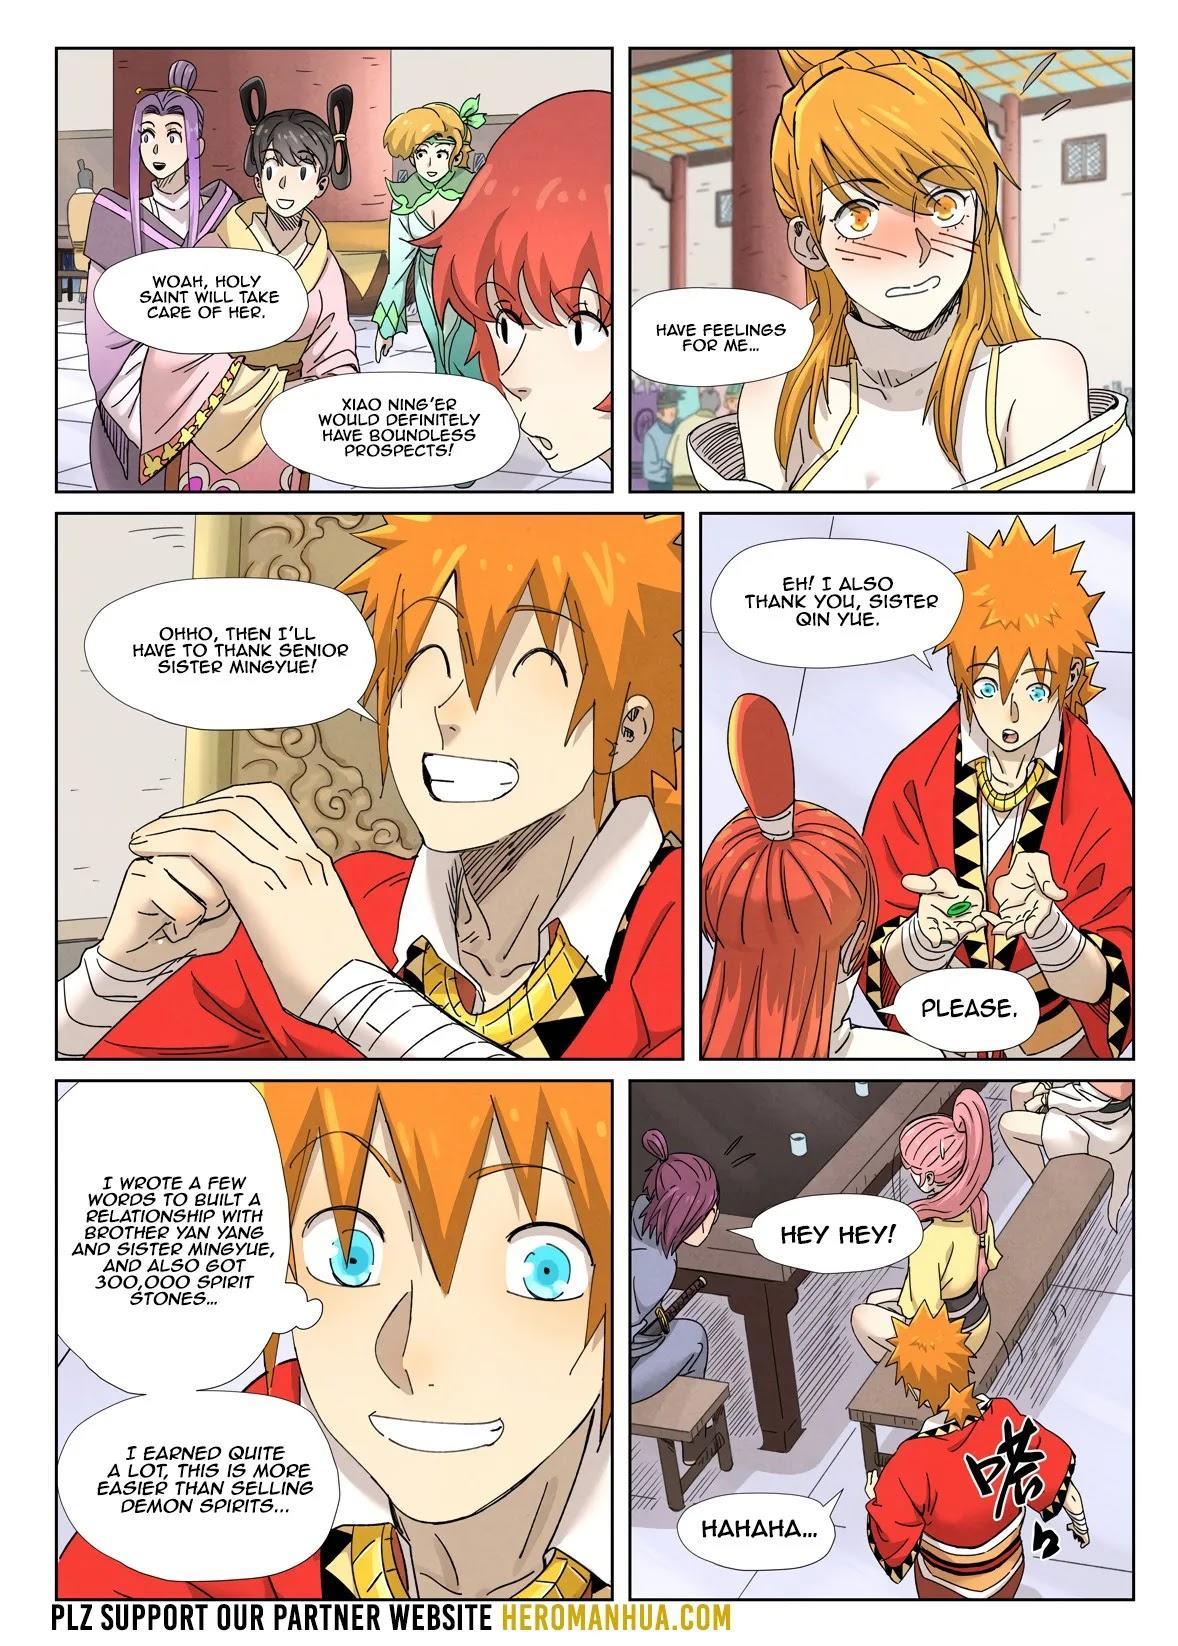 Tales Of Demons And Gods Chapter 342.1 page 11 - Mangakakalot